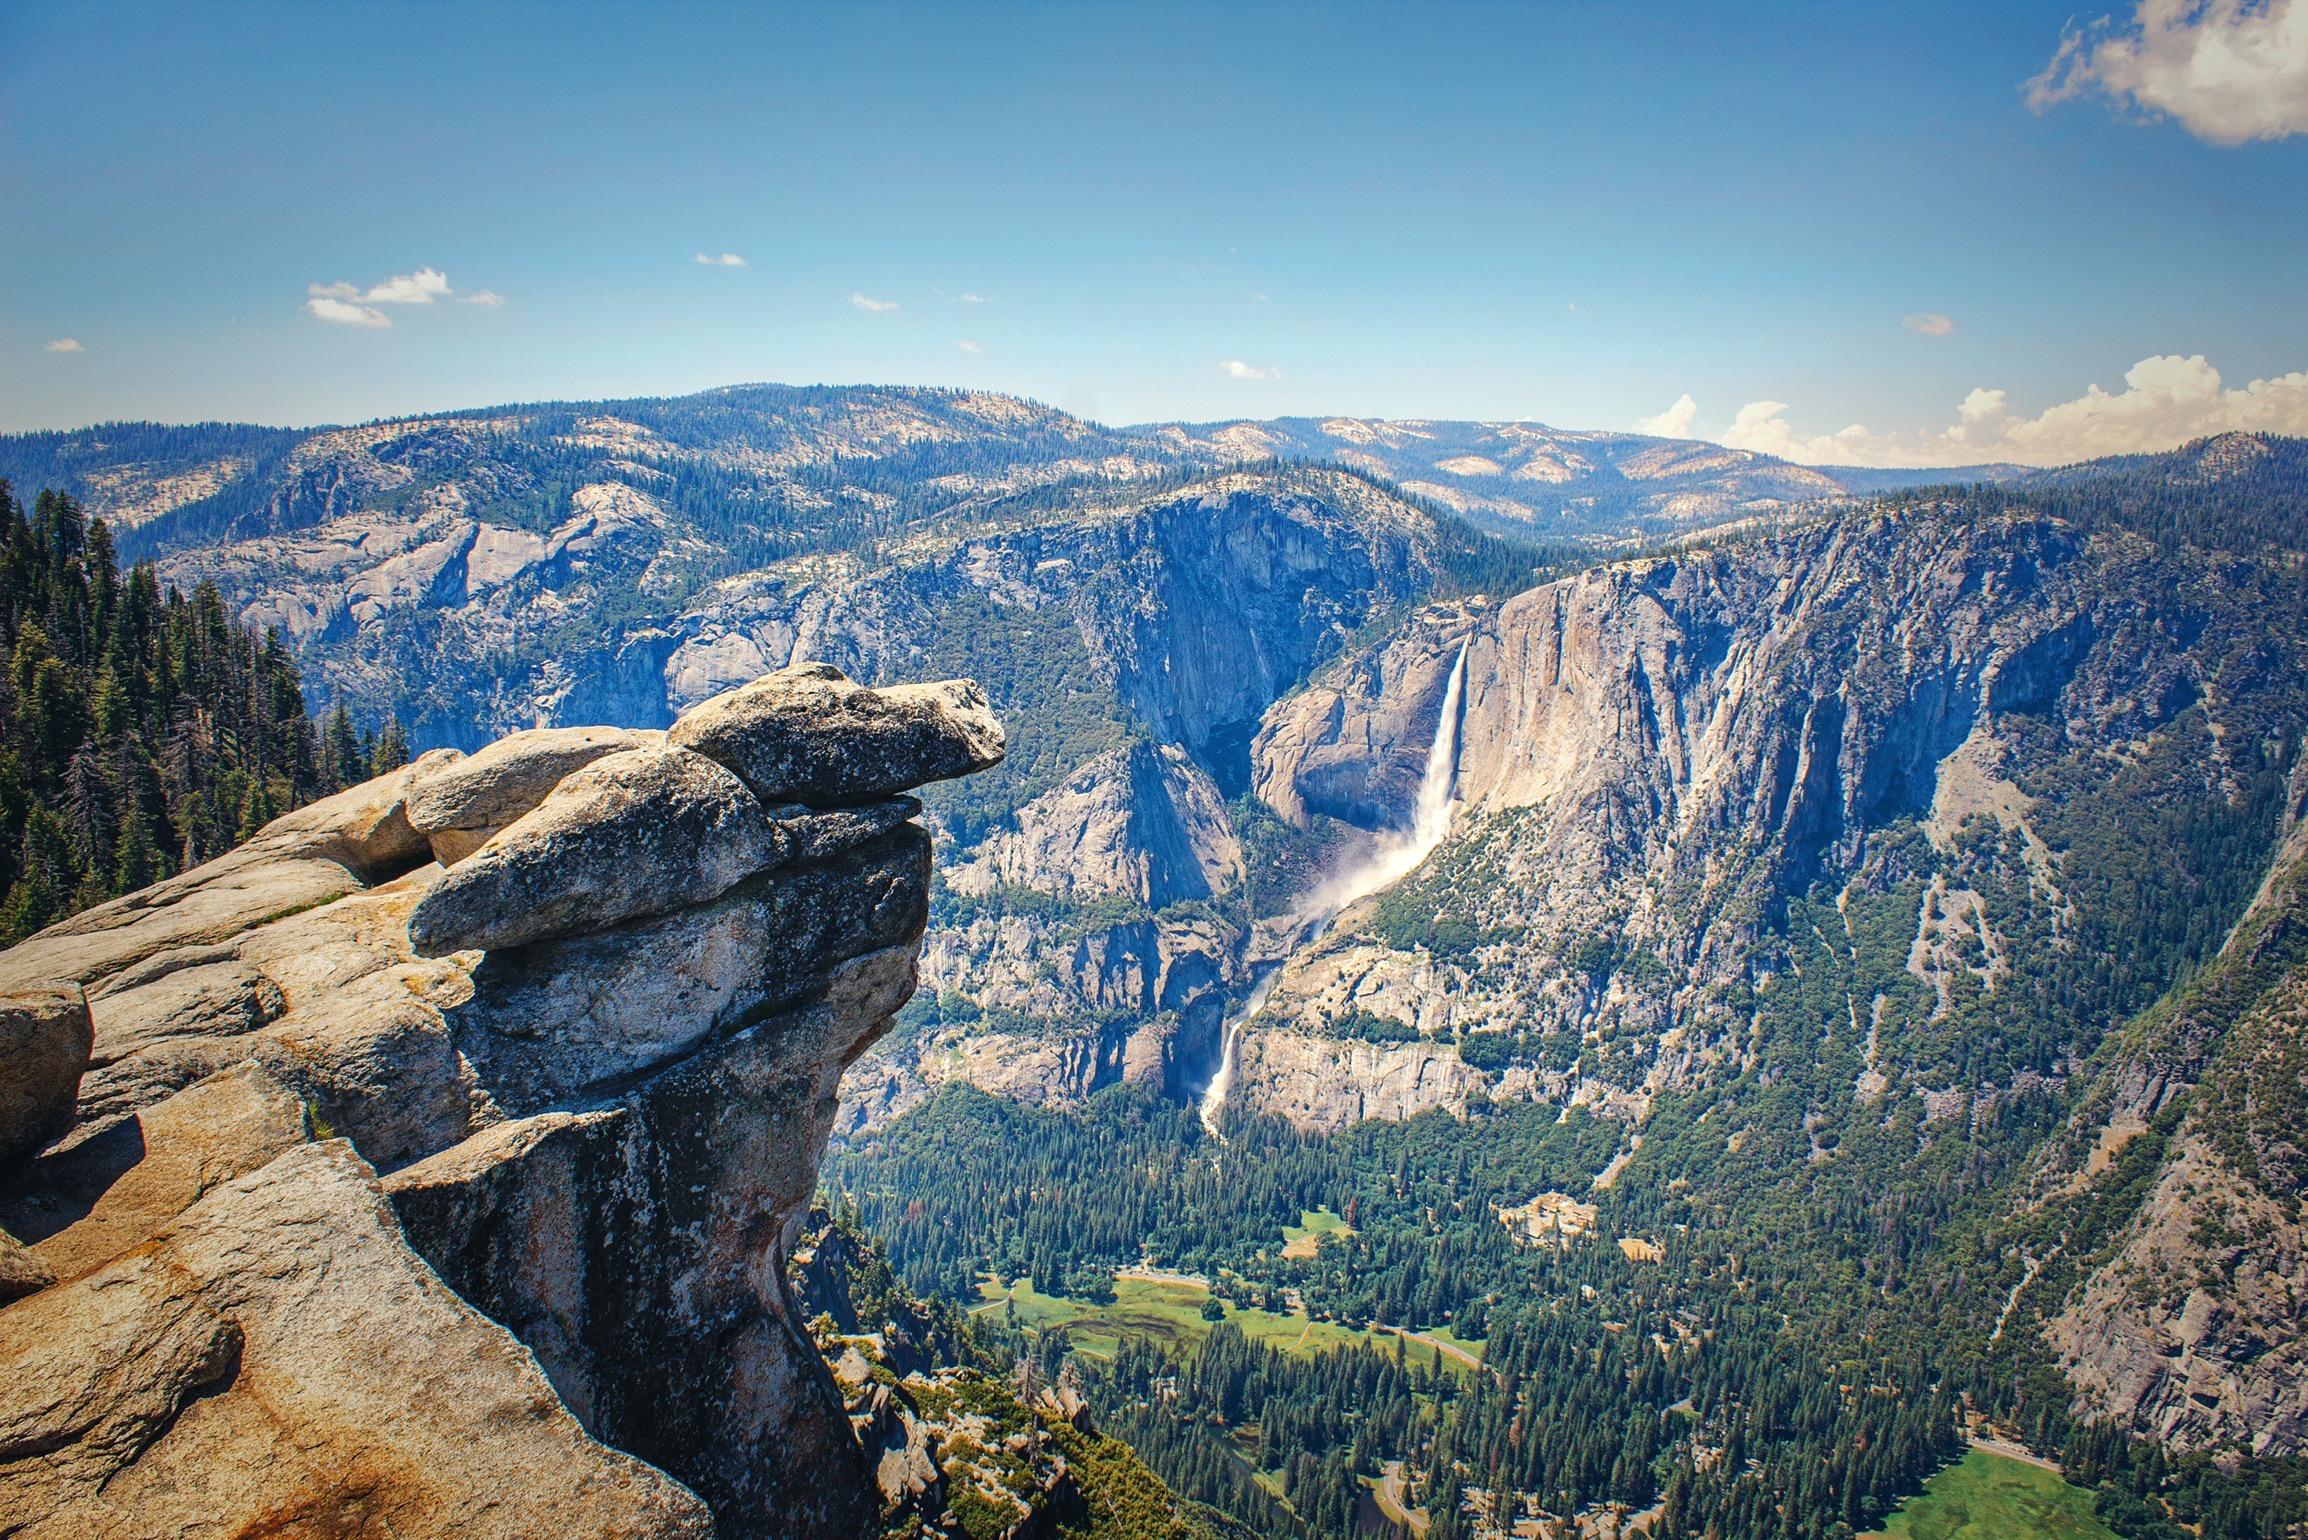 Glacier Point - Yosemite NP